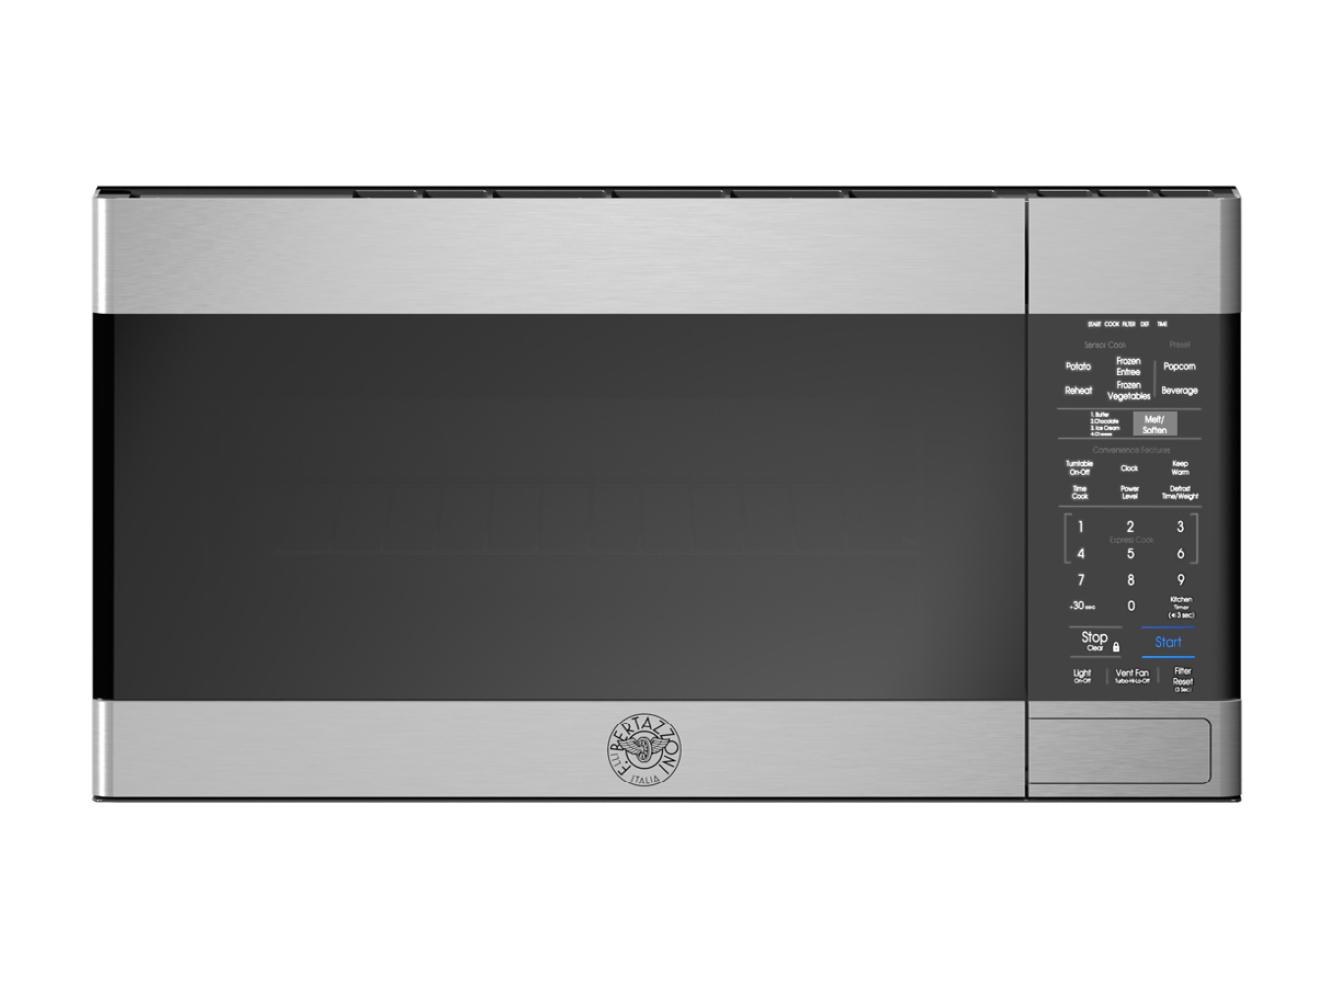 "Bertazzoni 30"" OTR Microwave Hood - 300 CFM - NO HANDLE"